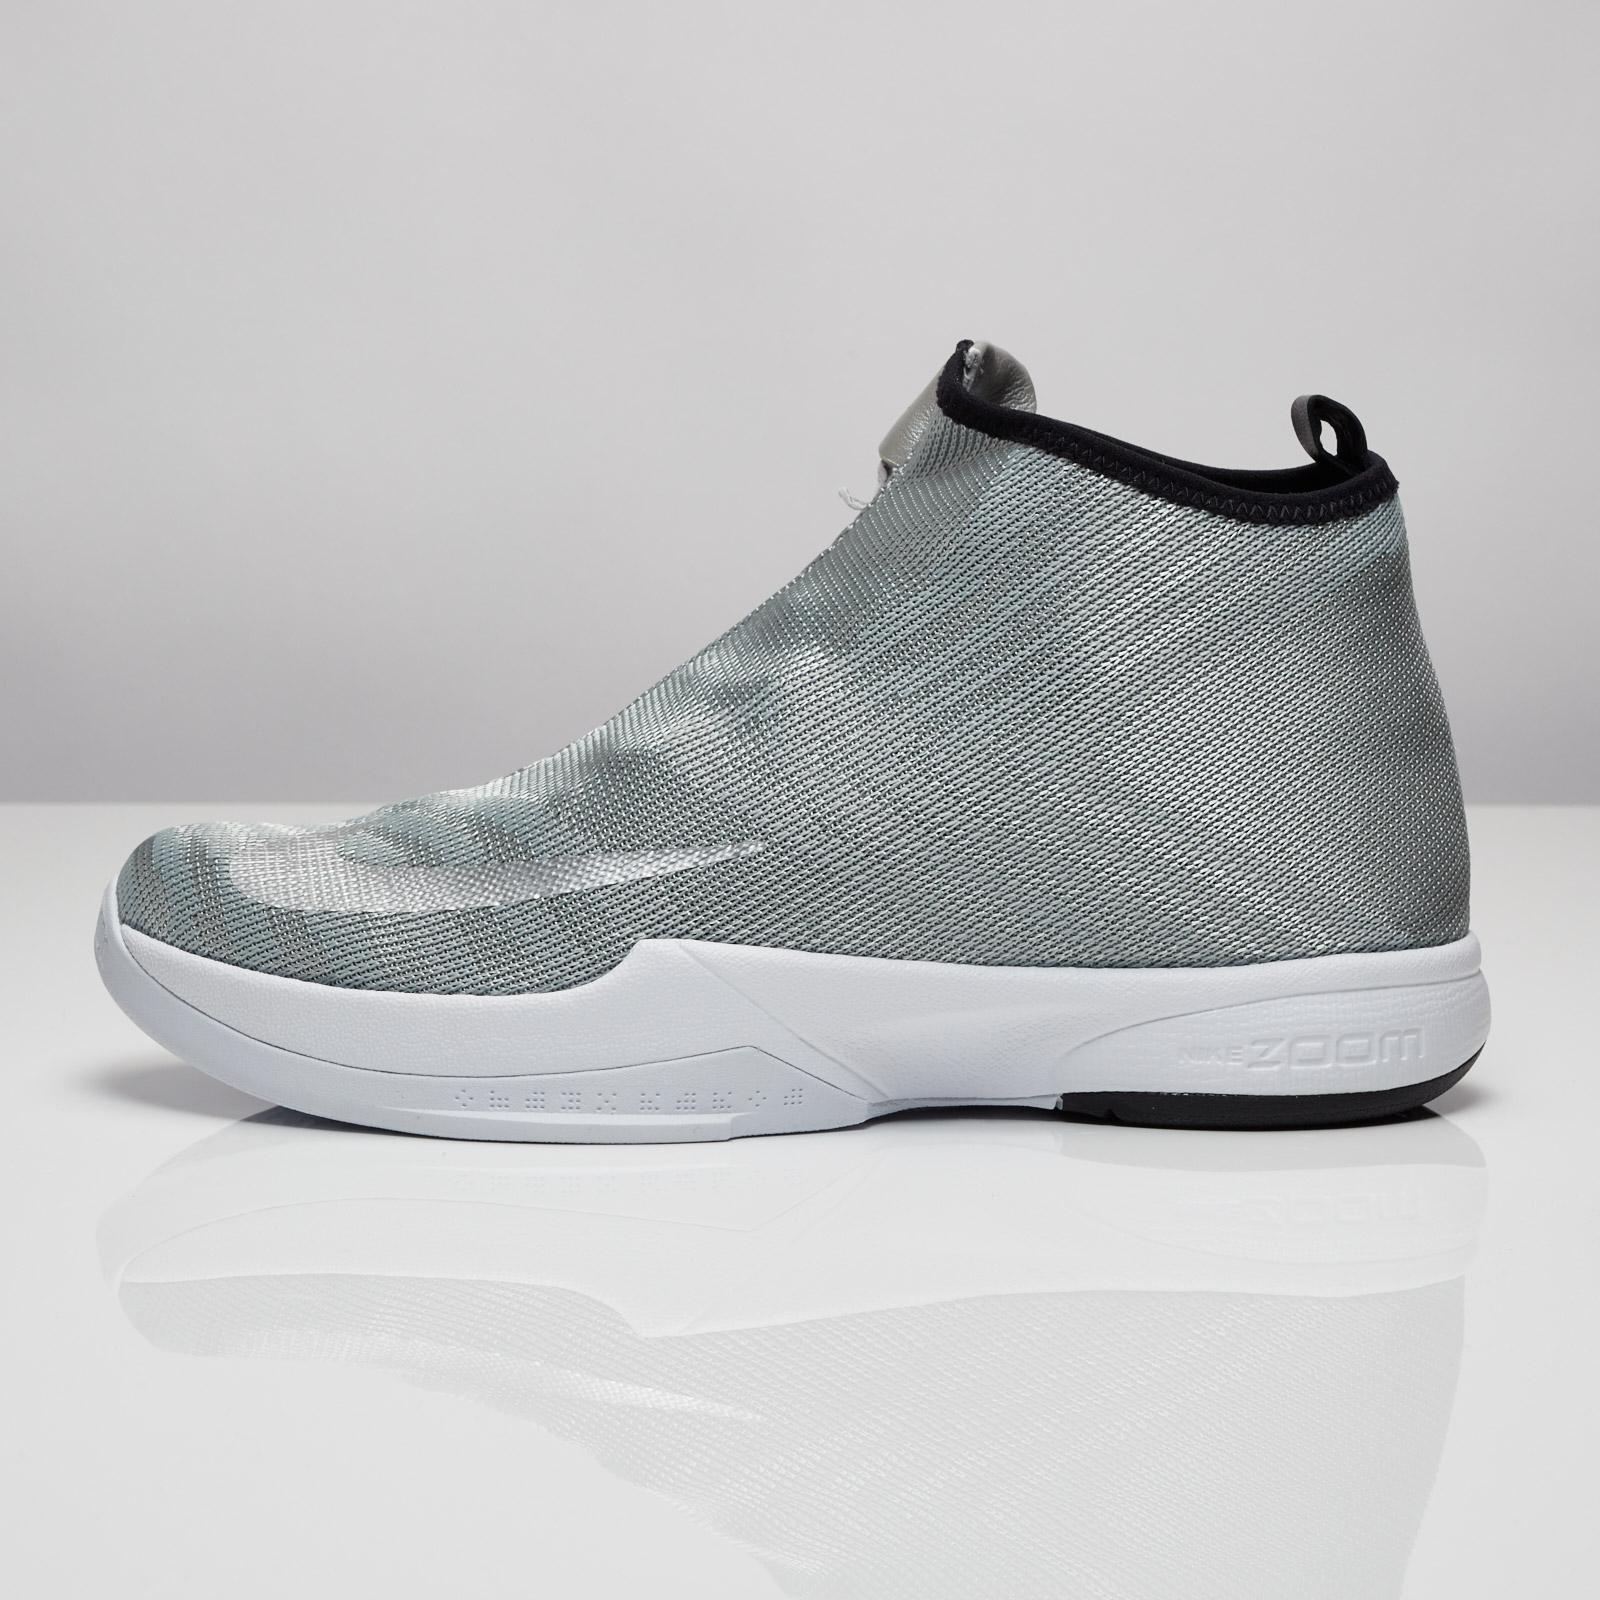 separation shoes 3522d cfd72 Nike Zoom Kobe Icon Jacquard Premium - 832836-001 - Sneakersnstuff    sneakers   streetwear online since 1999